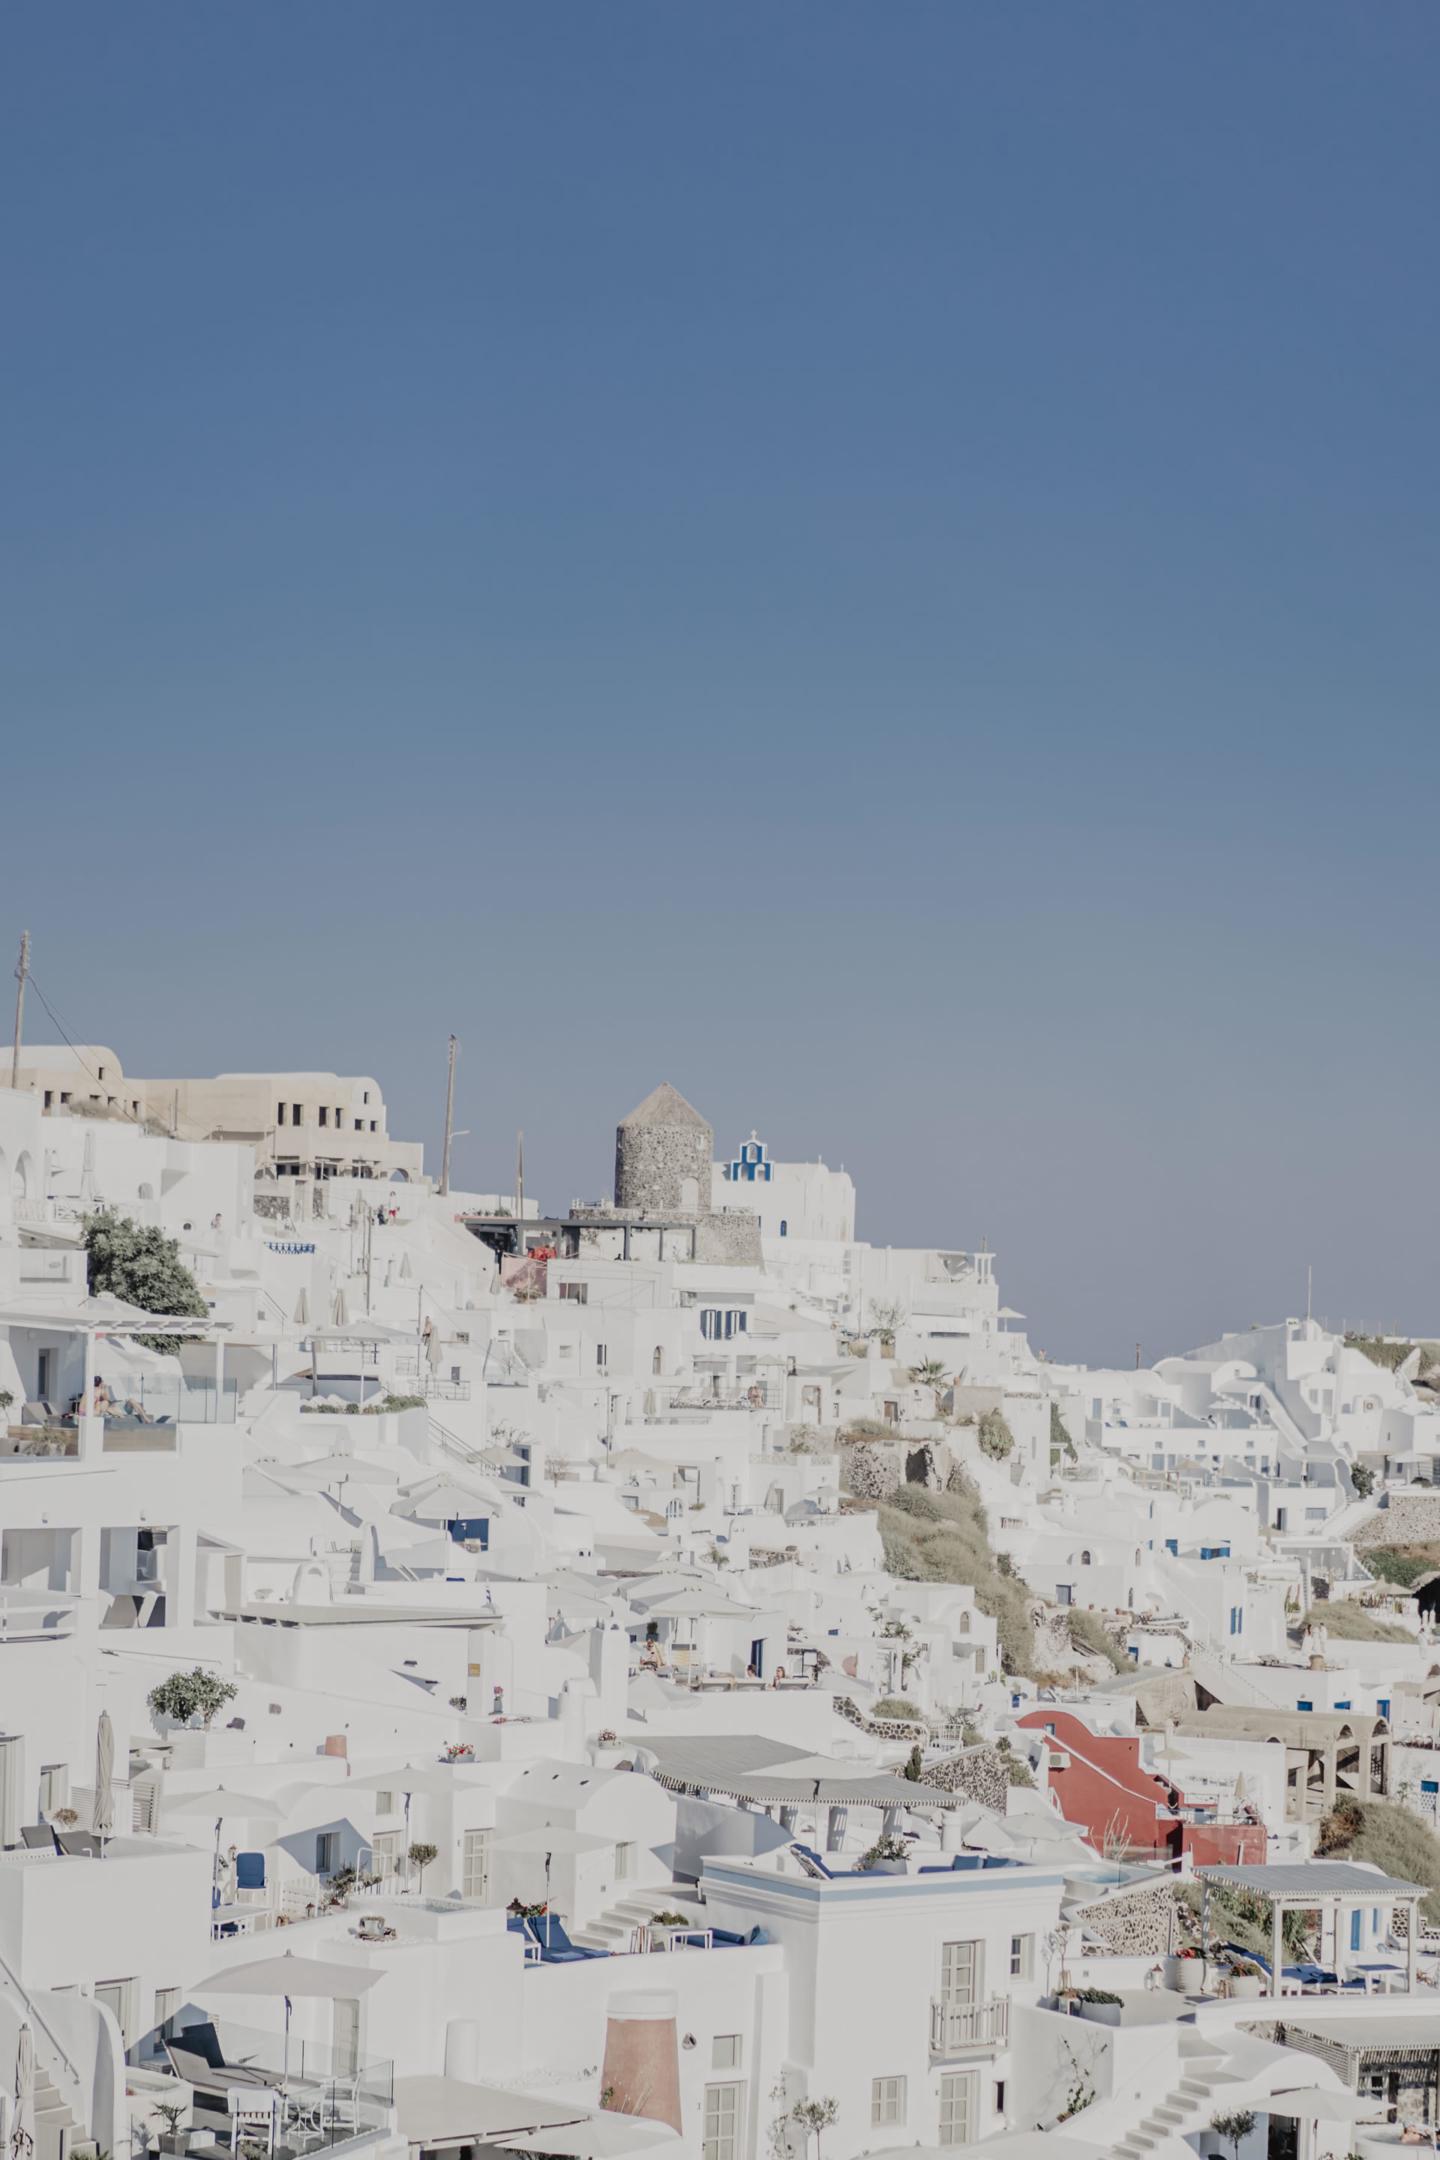 - 24 :: Santorini, a white wedding in a white island :: Luxury wedding photography - 23 ::  - 24